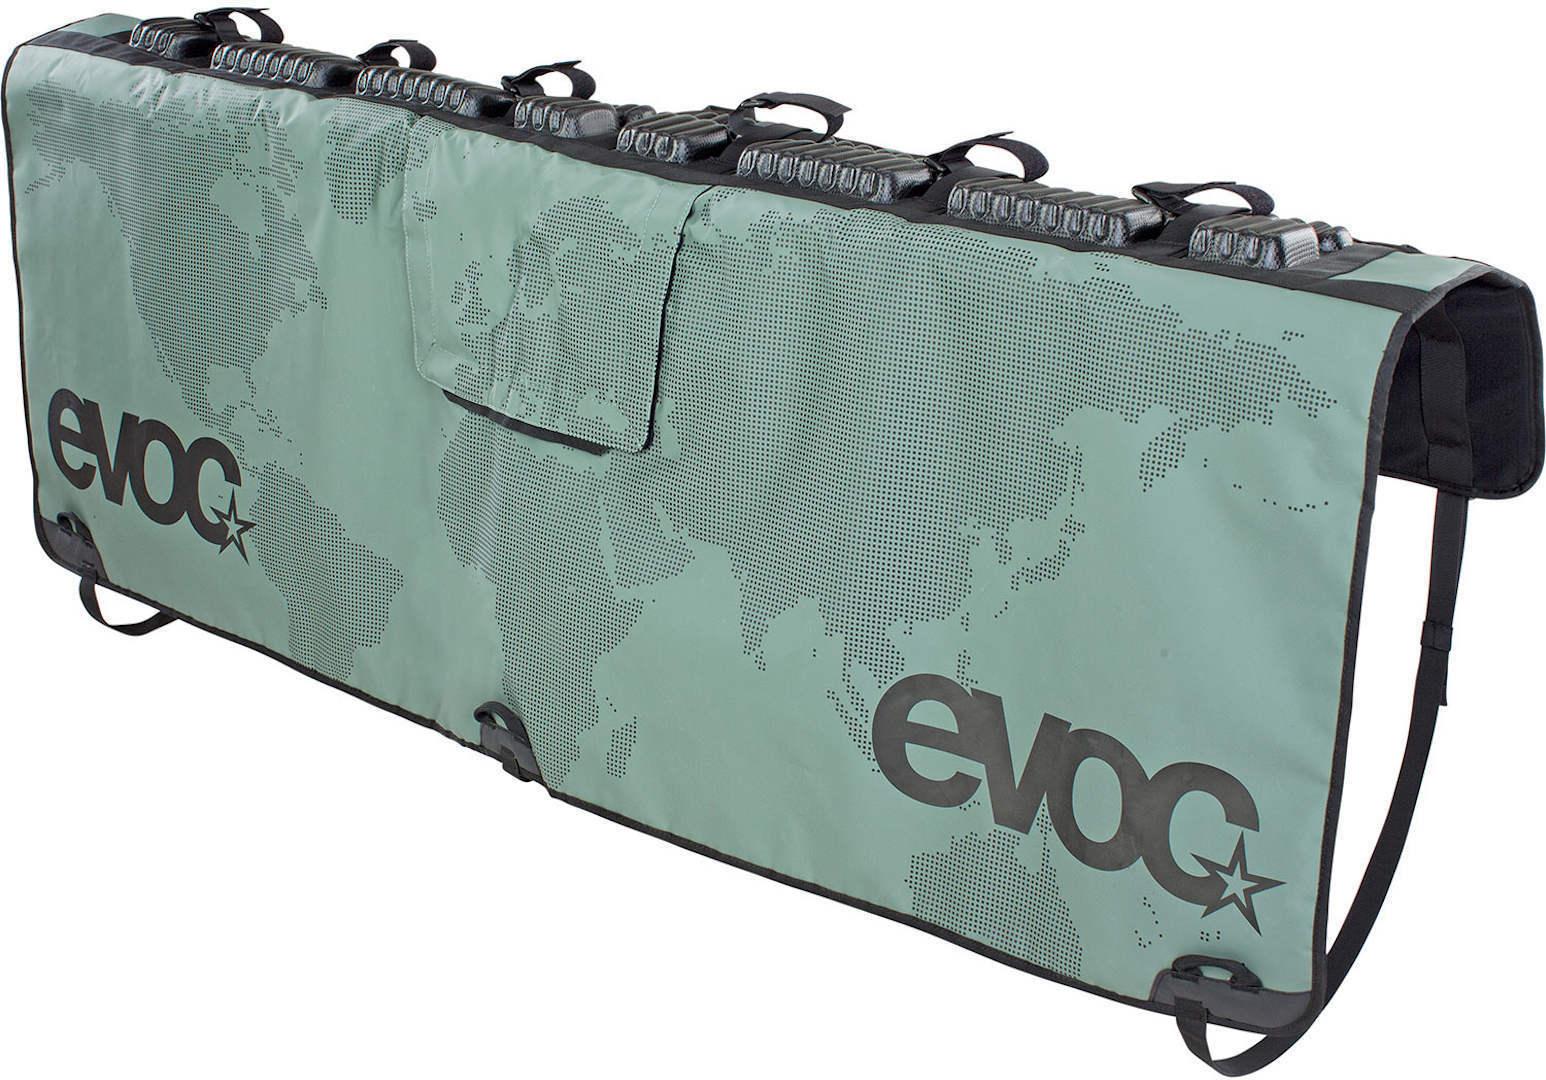 Evoc Tailgate Pad Transportschutz, grün, Größe M L, grün, Größe M L